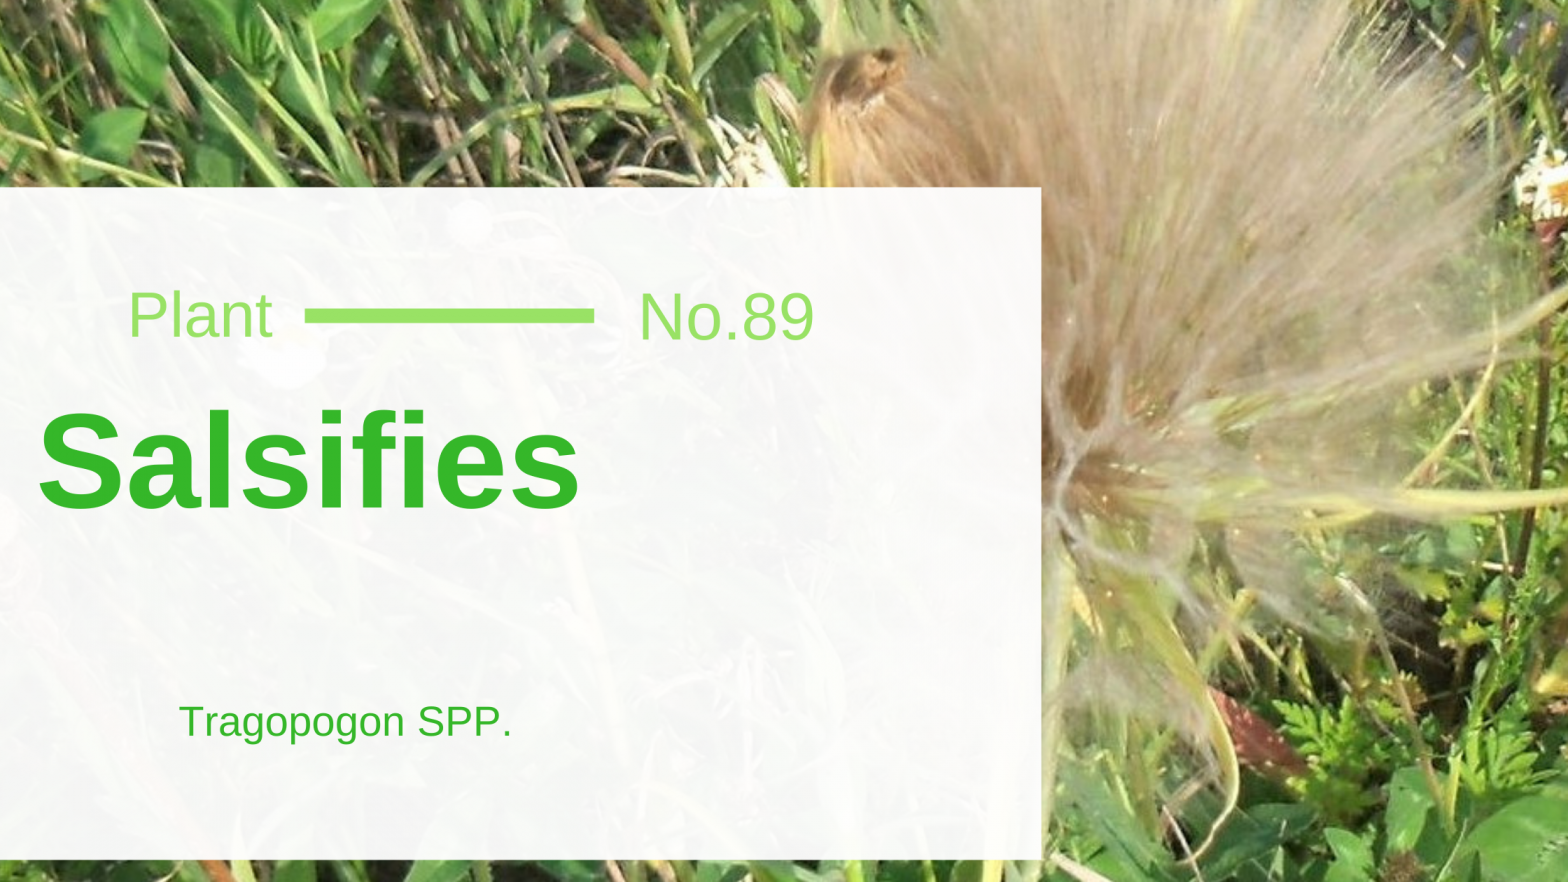 Salsifies - Tragopogon SPP.: Oyster of Edible & Medicinal Wild Plants